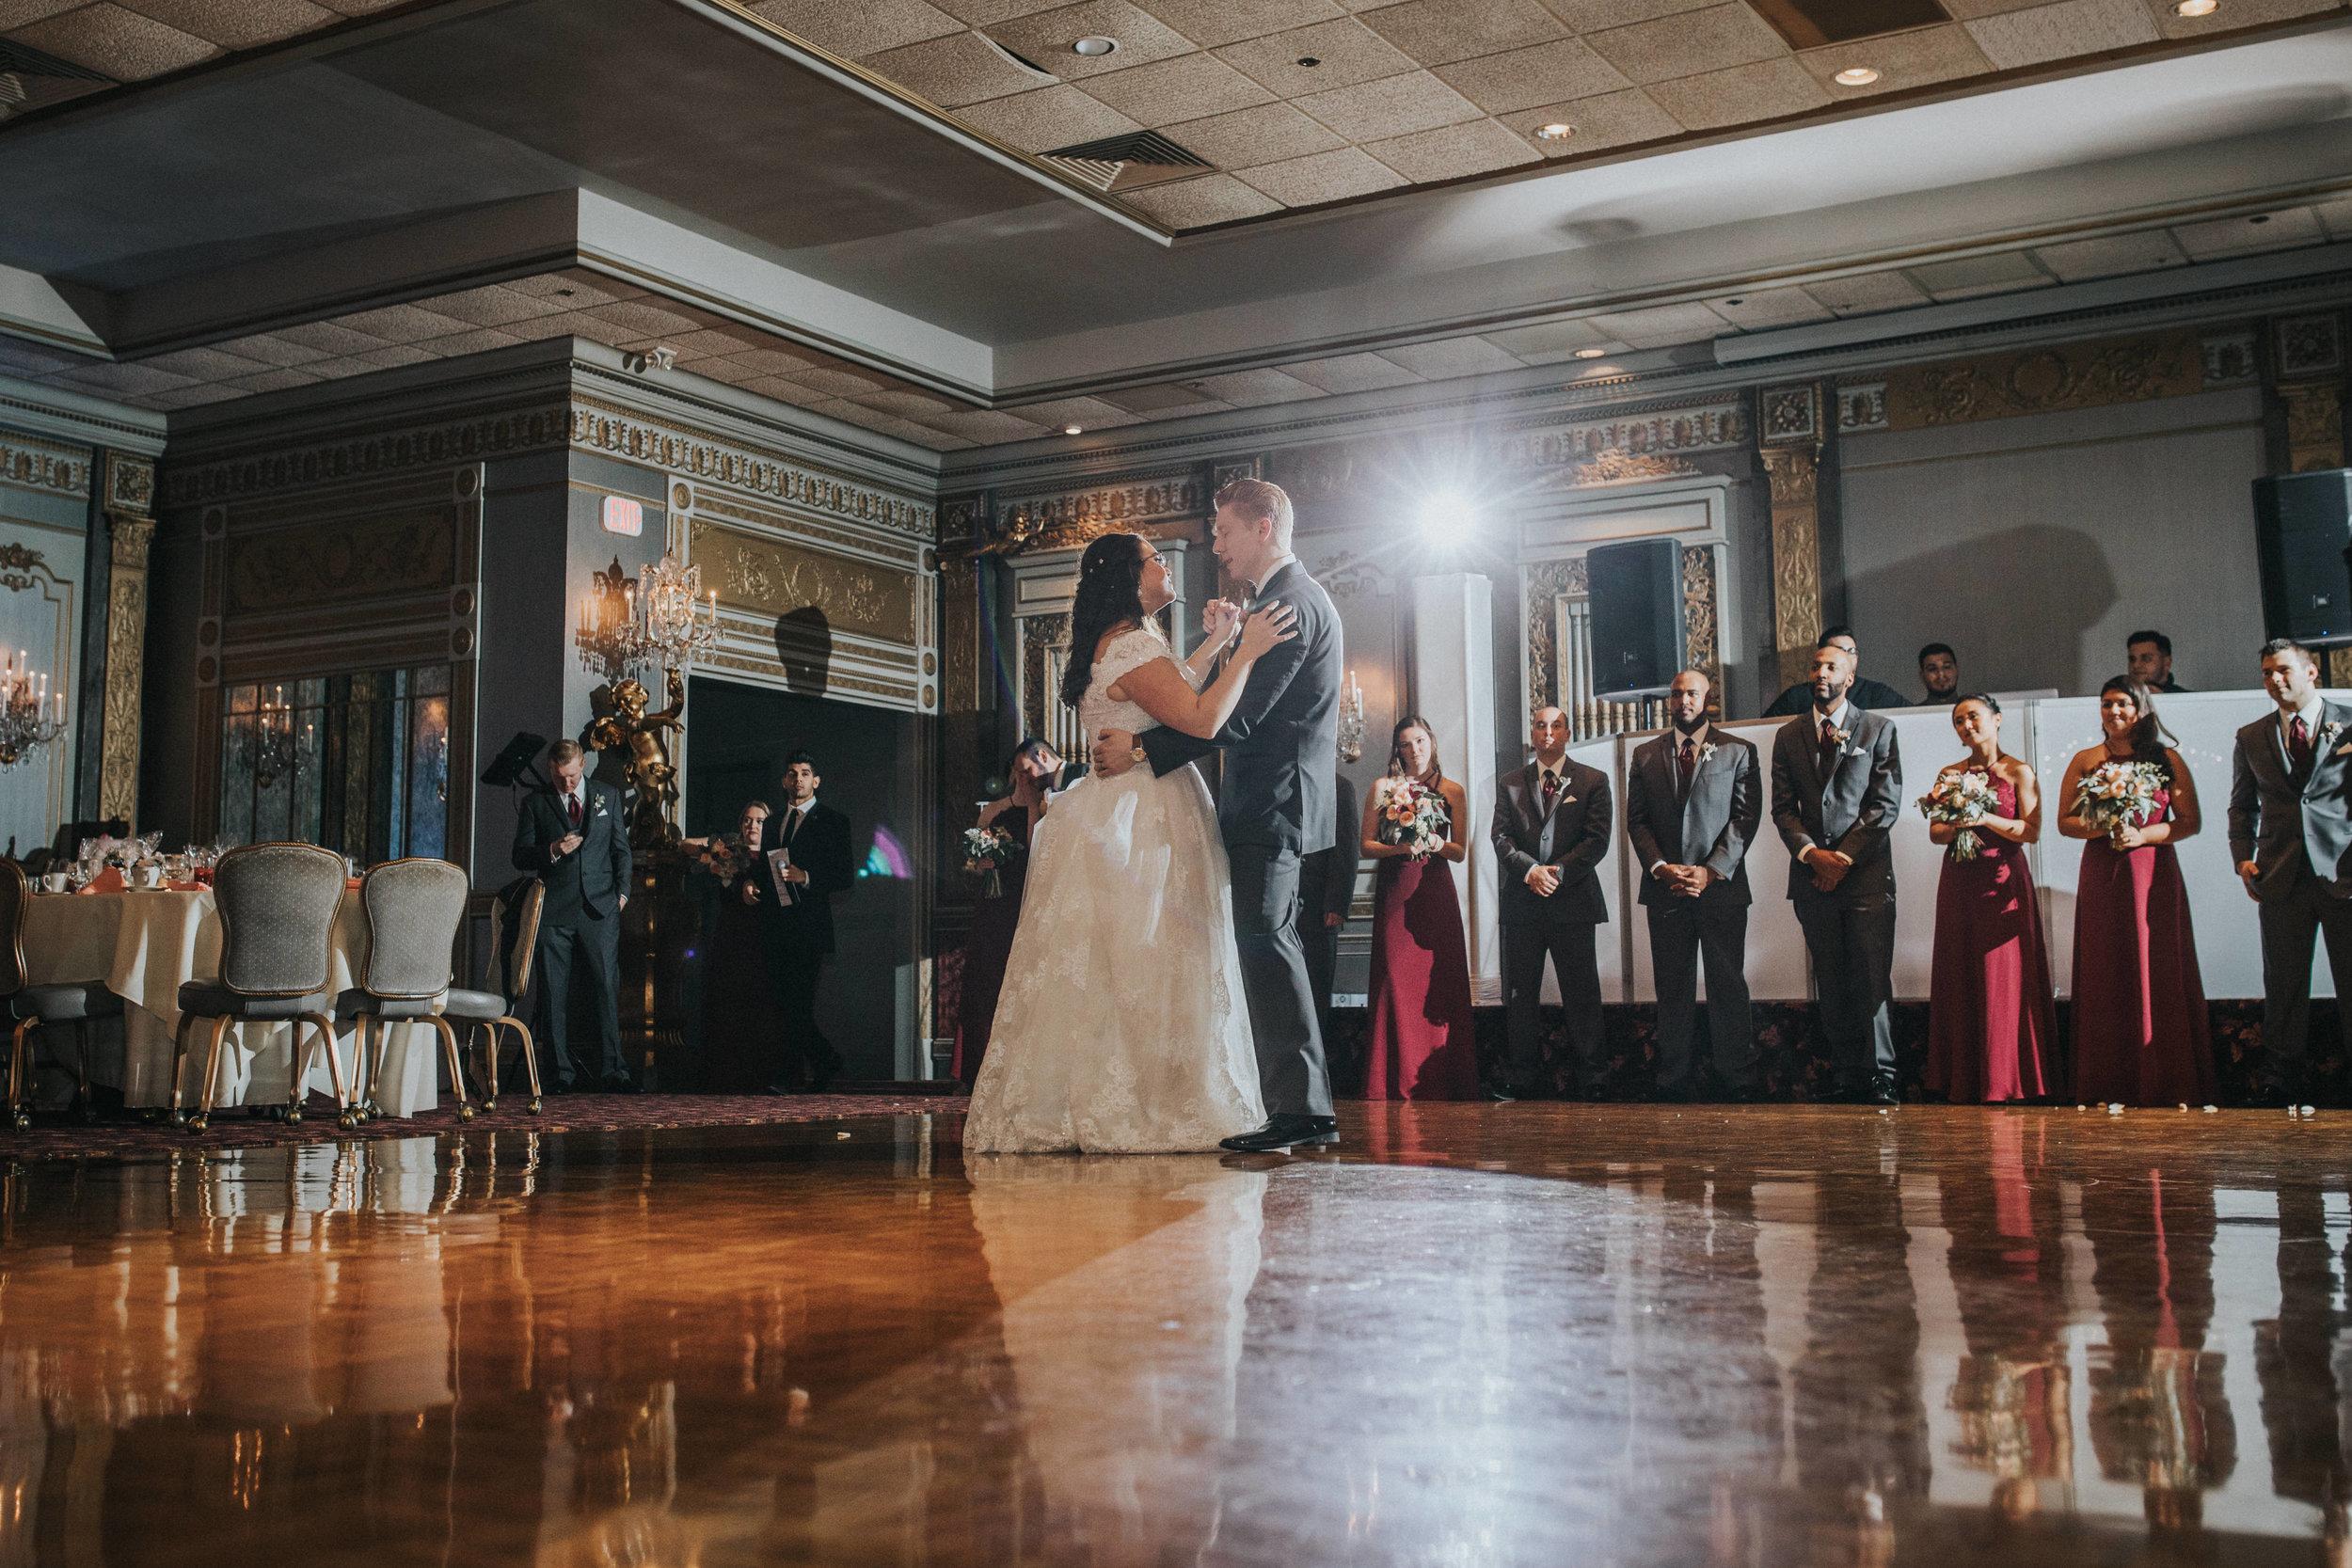 New-Jersey-Wedding-Photography-Fishers-Tudor-House-JennaLynnPhotography-Reception-Kathleen&Eddie-23.jpg